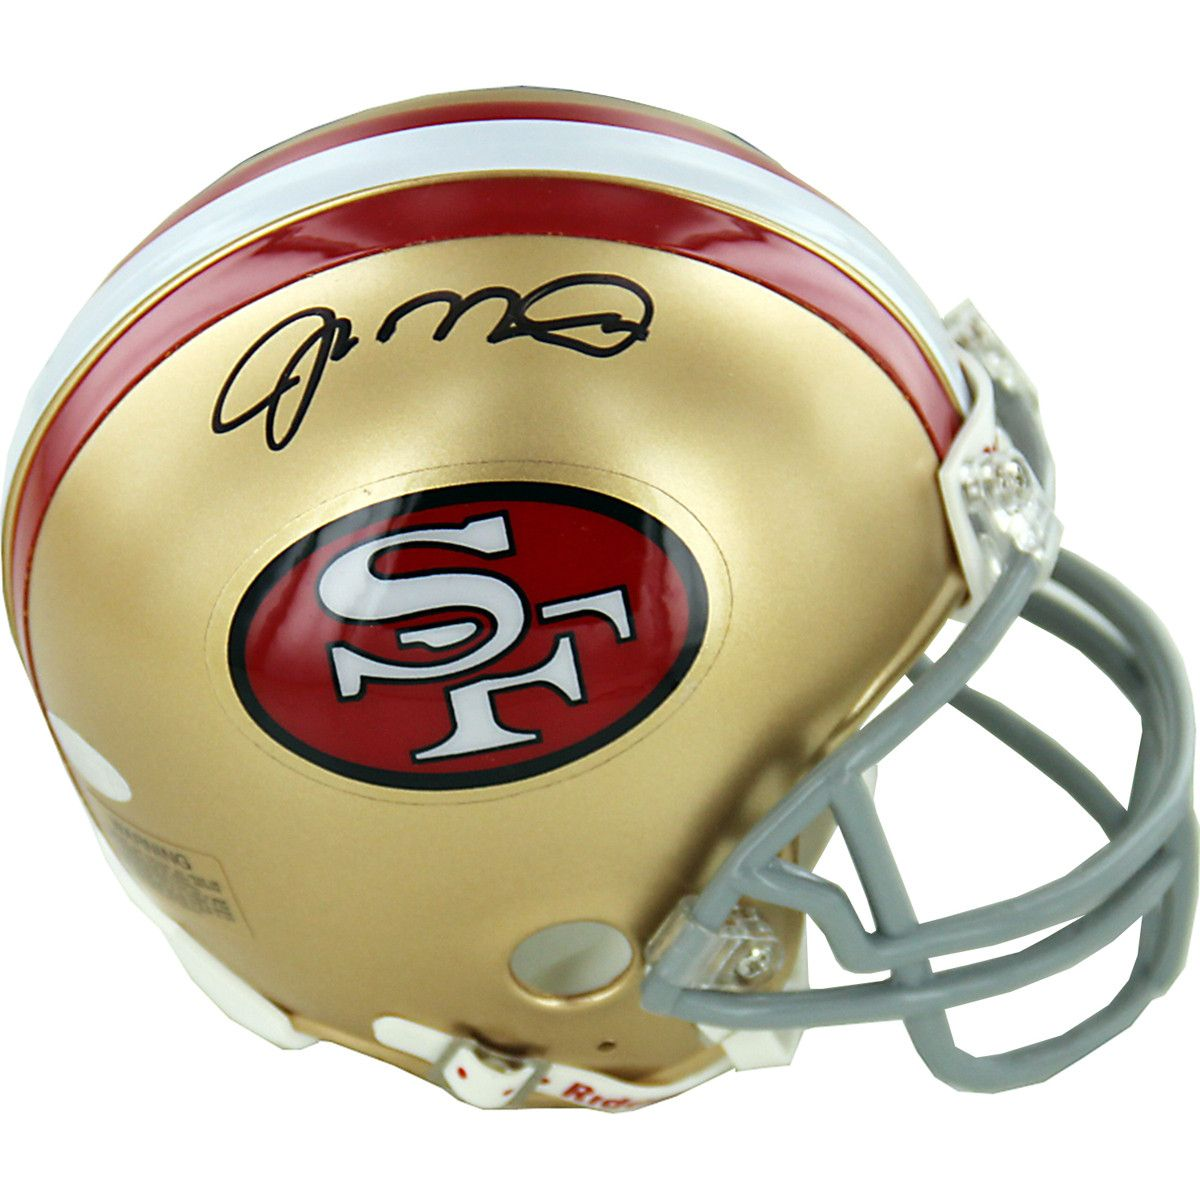 Joe Montana Signed San Francisco 49ers Replica Mini Helmet - 49ers Legend Joe  Montana has personally 1ed305327